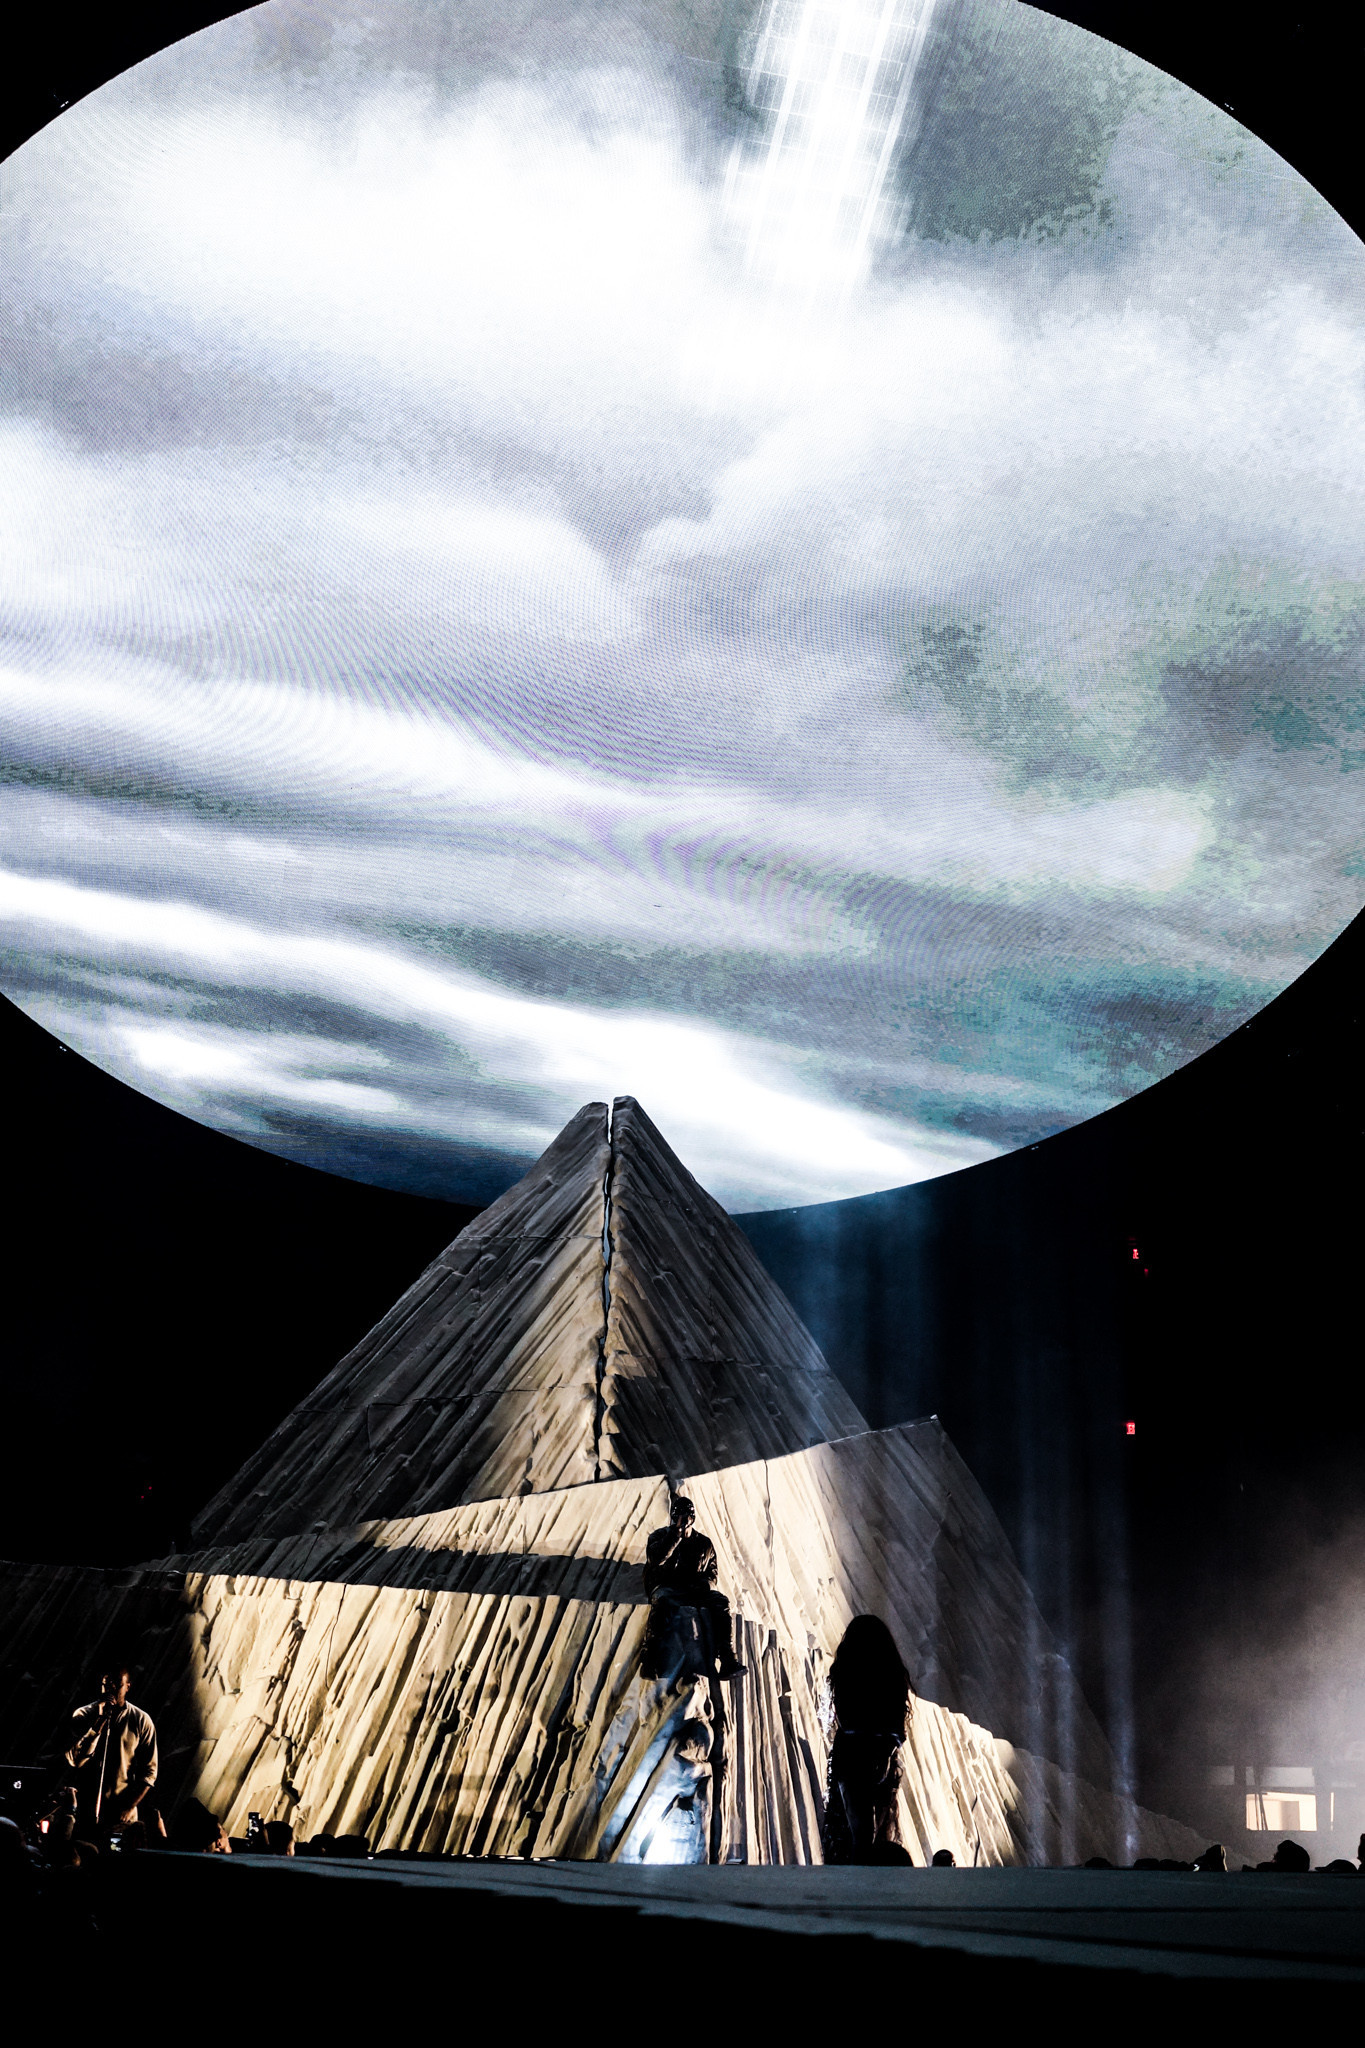 HD YEEZUS Tour Wallpapers (Desktop & Phone) [UPDATED!!] Â« Kanye